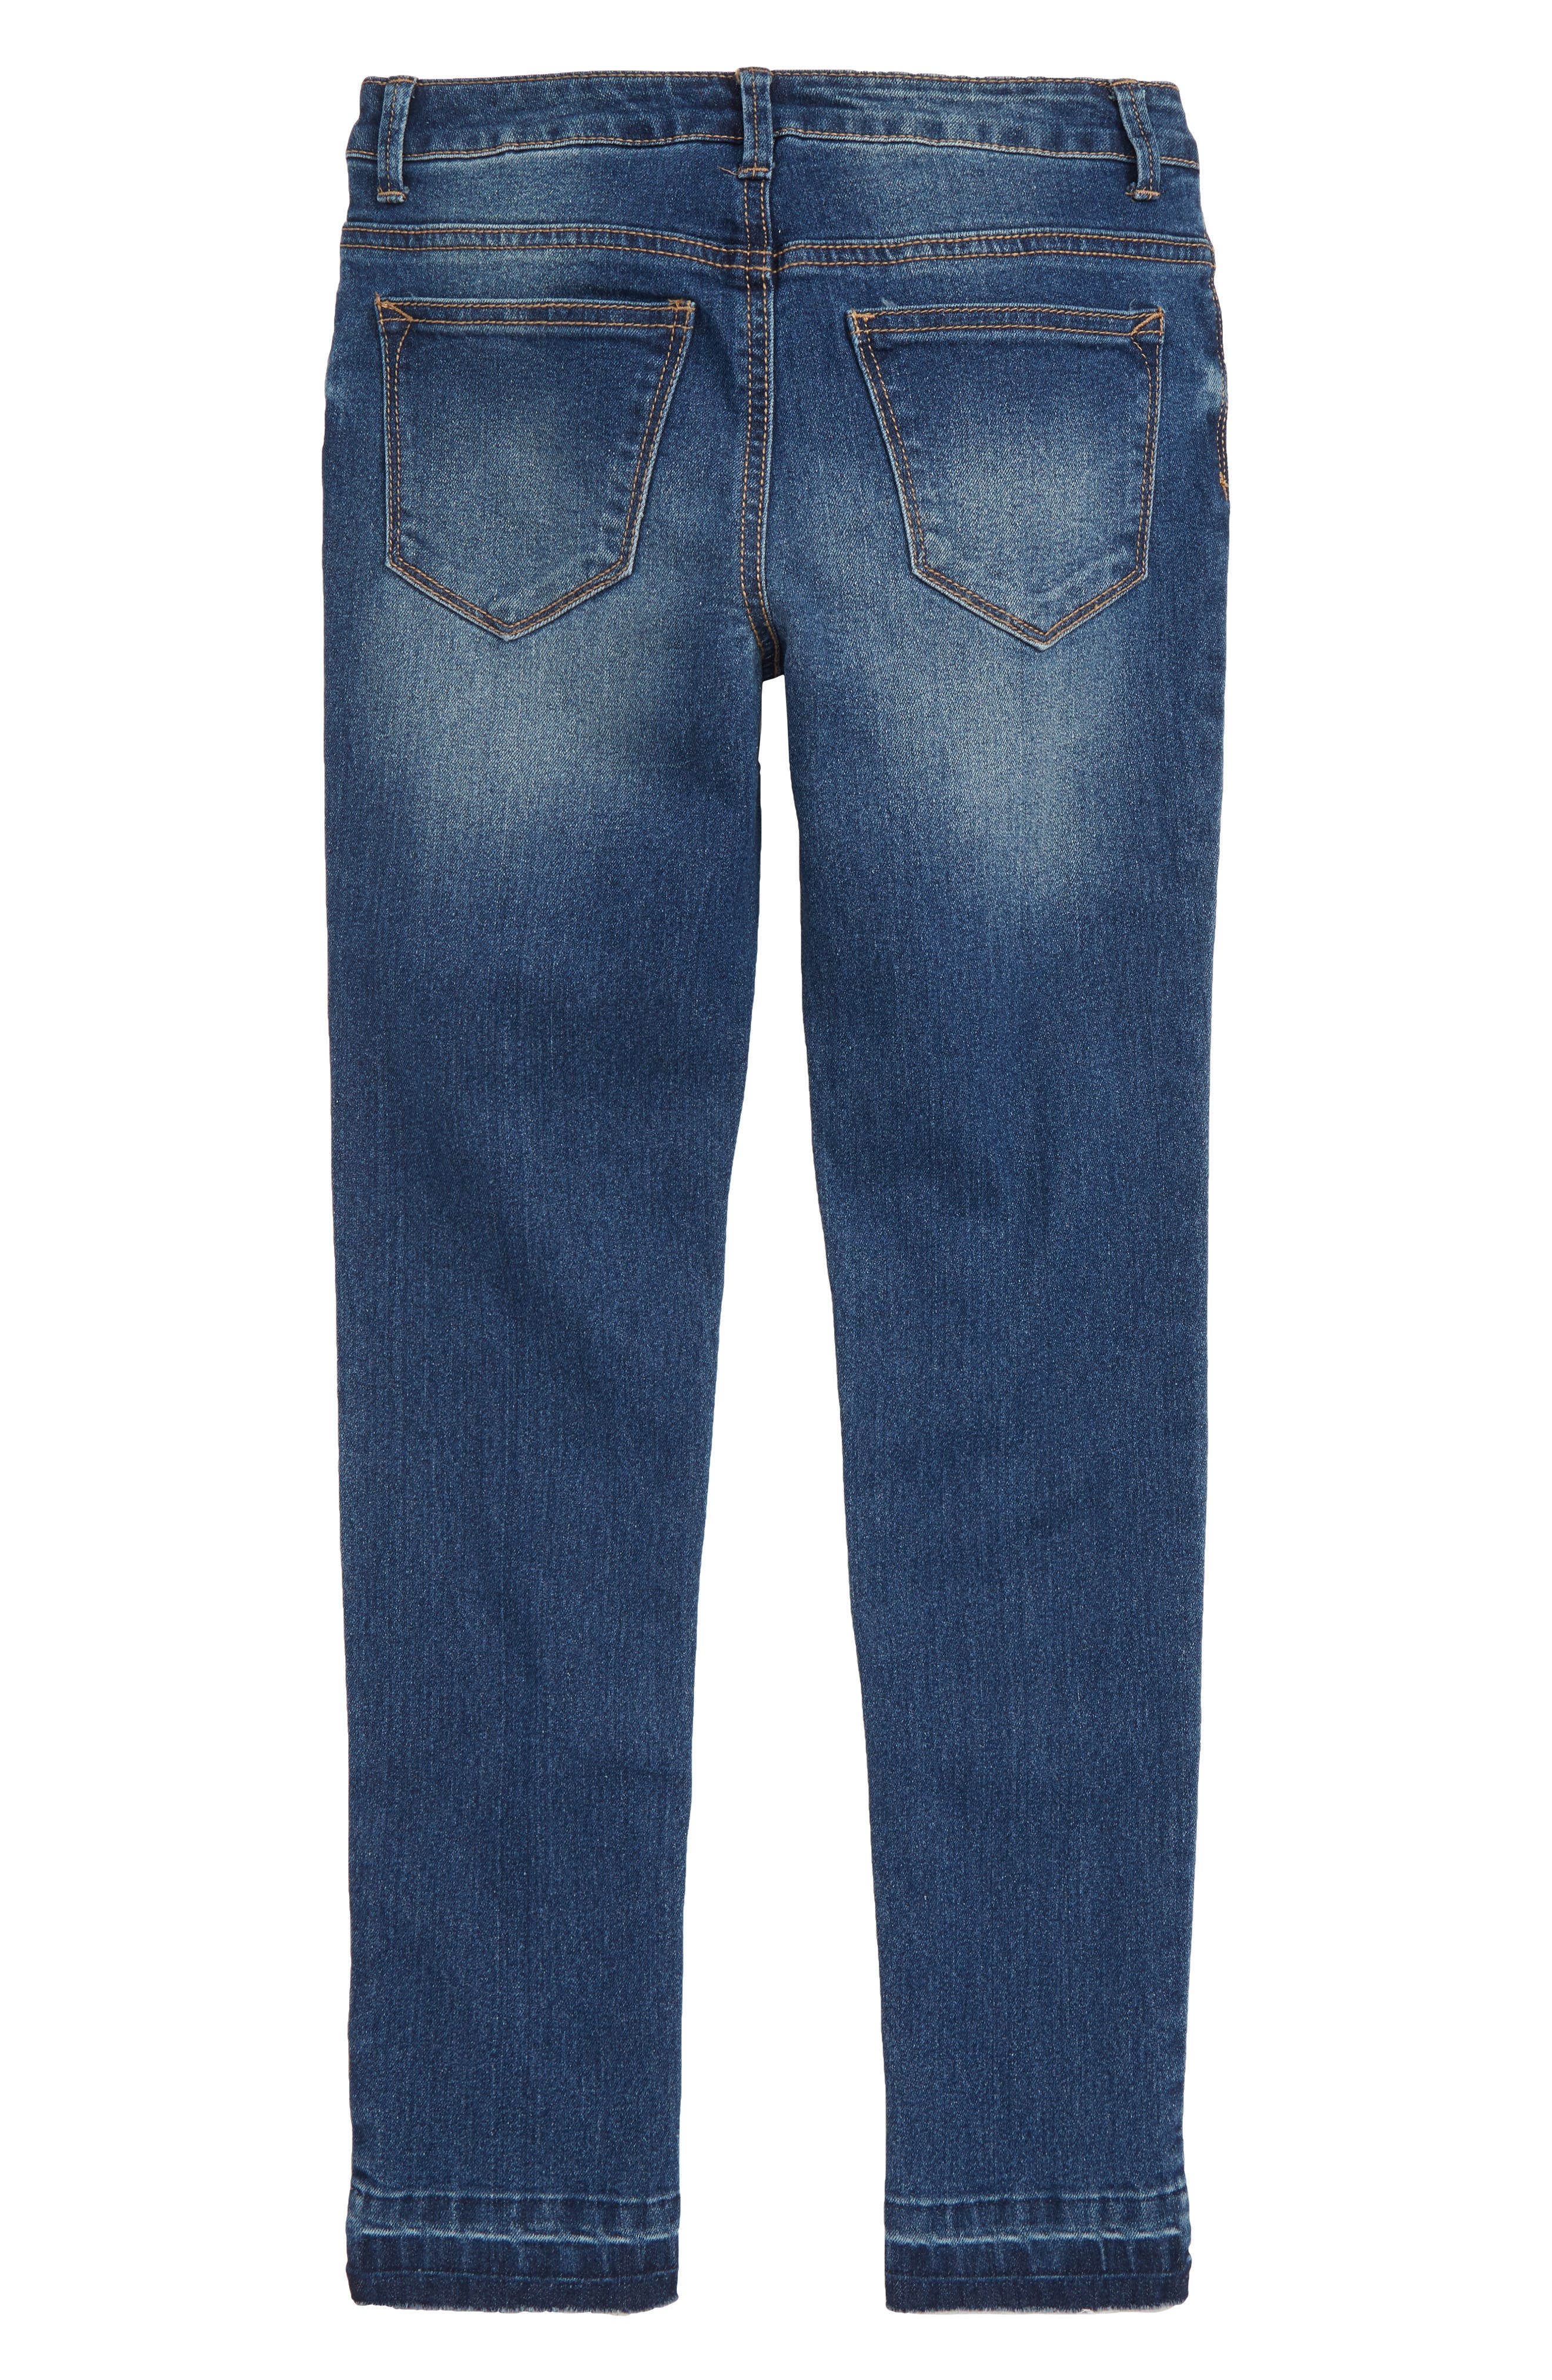 Star Appliqué Skinny Jeans,                             Alternate thumbnail 2, color,                             Blue